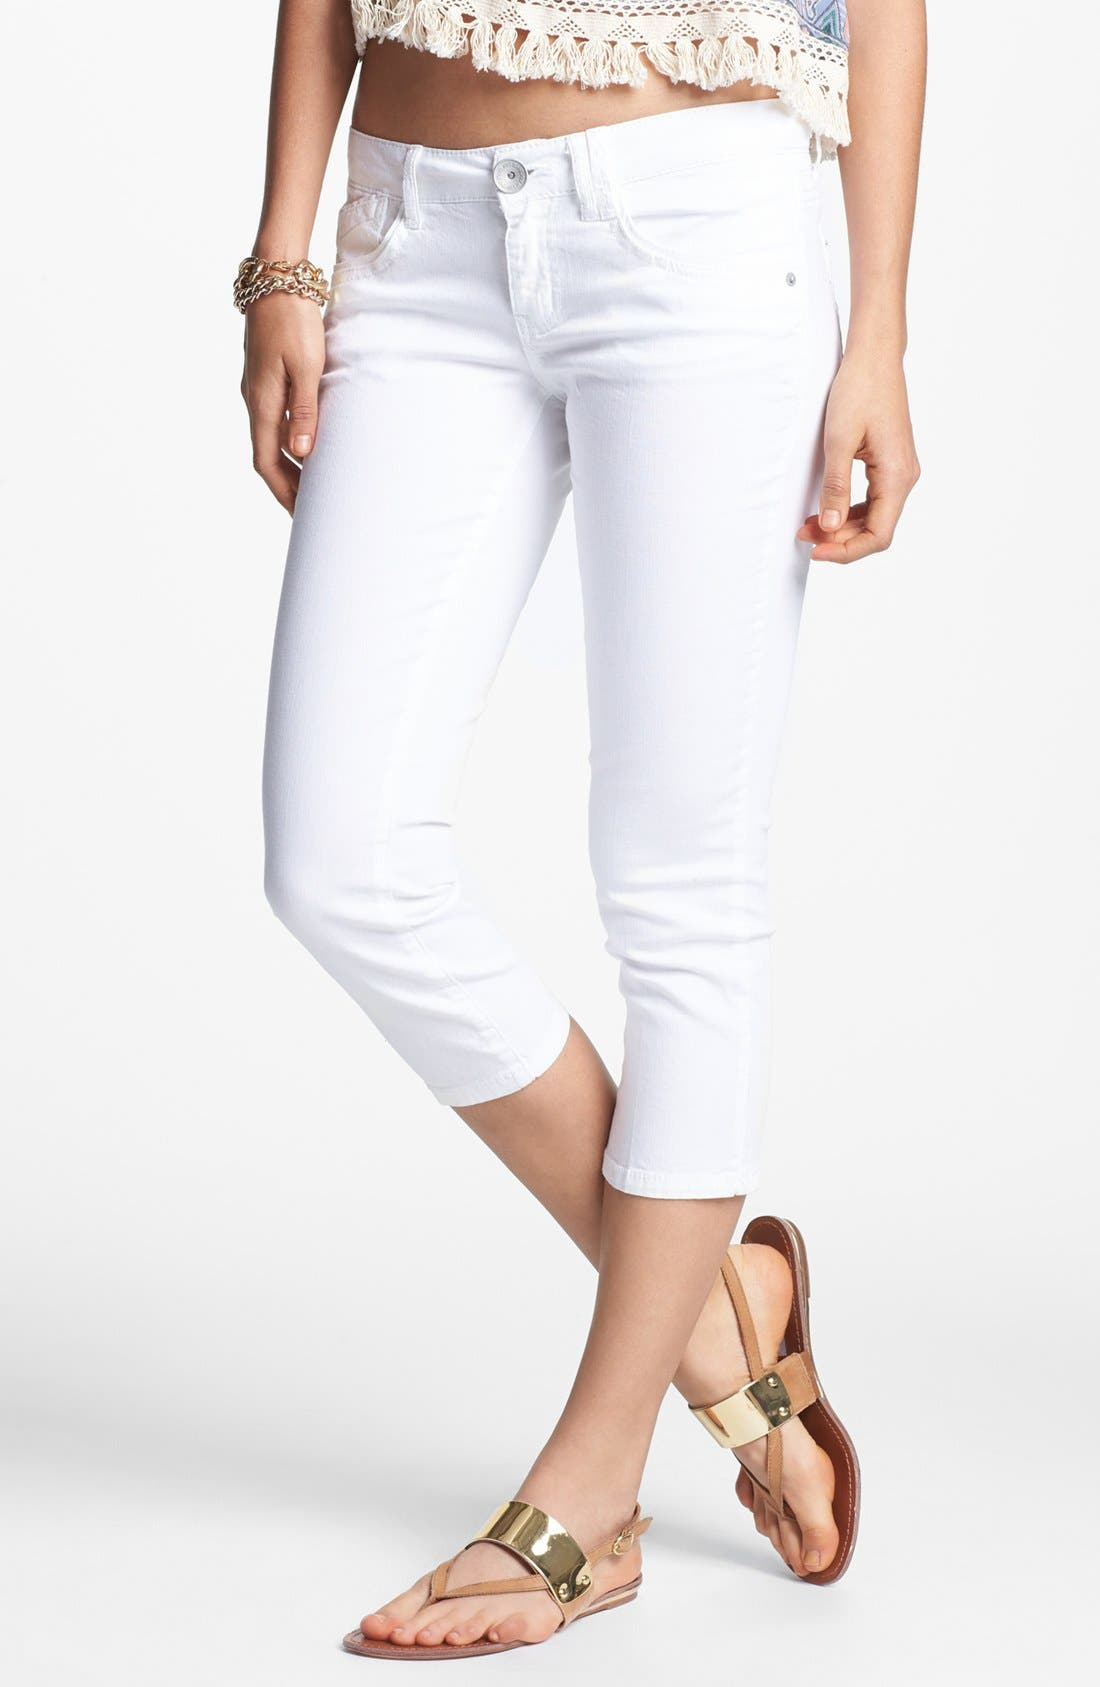 Main Image - Jolt Crop Skinny Jeans (White) (Juniors)